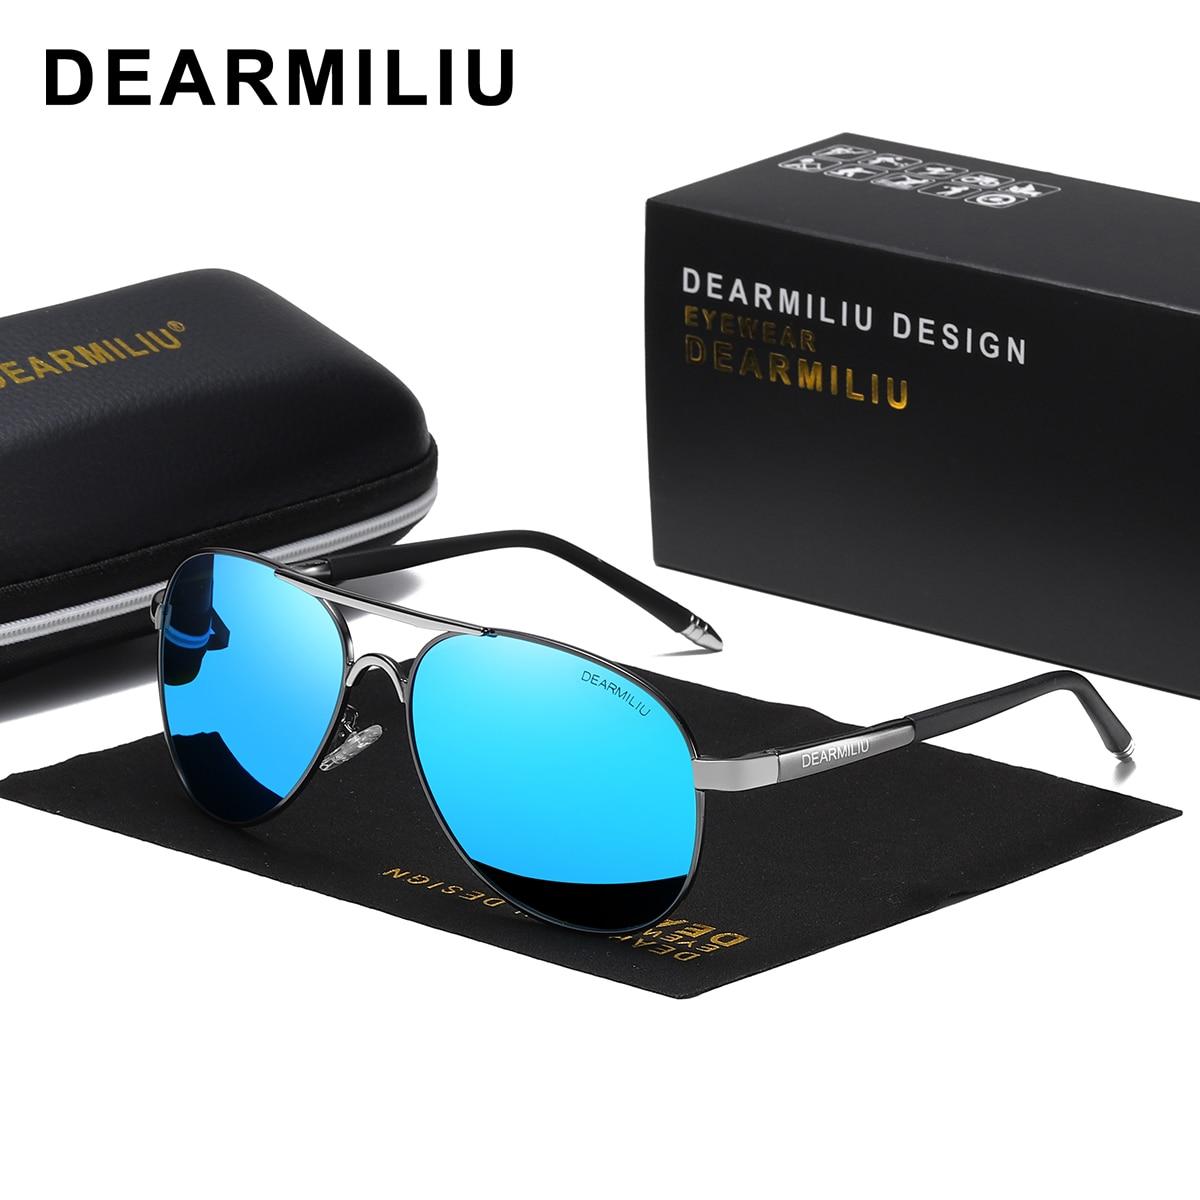 DEARMILIU Polarized UV 400 men's Sunglasses brand new male cool driving Sun Glasses driving eyewear gafas de sol shades with box